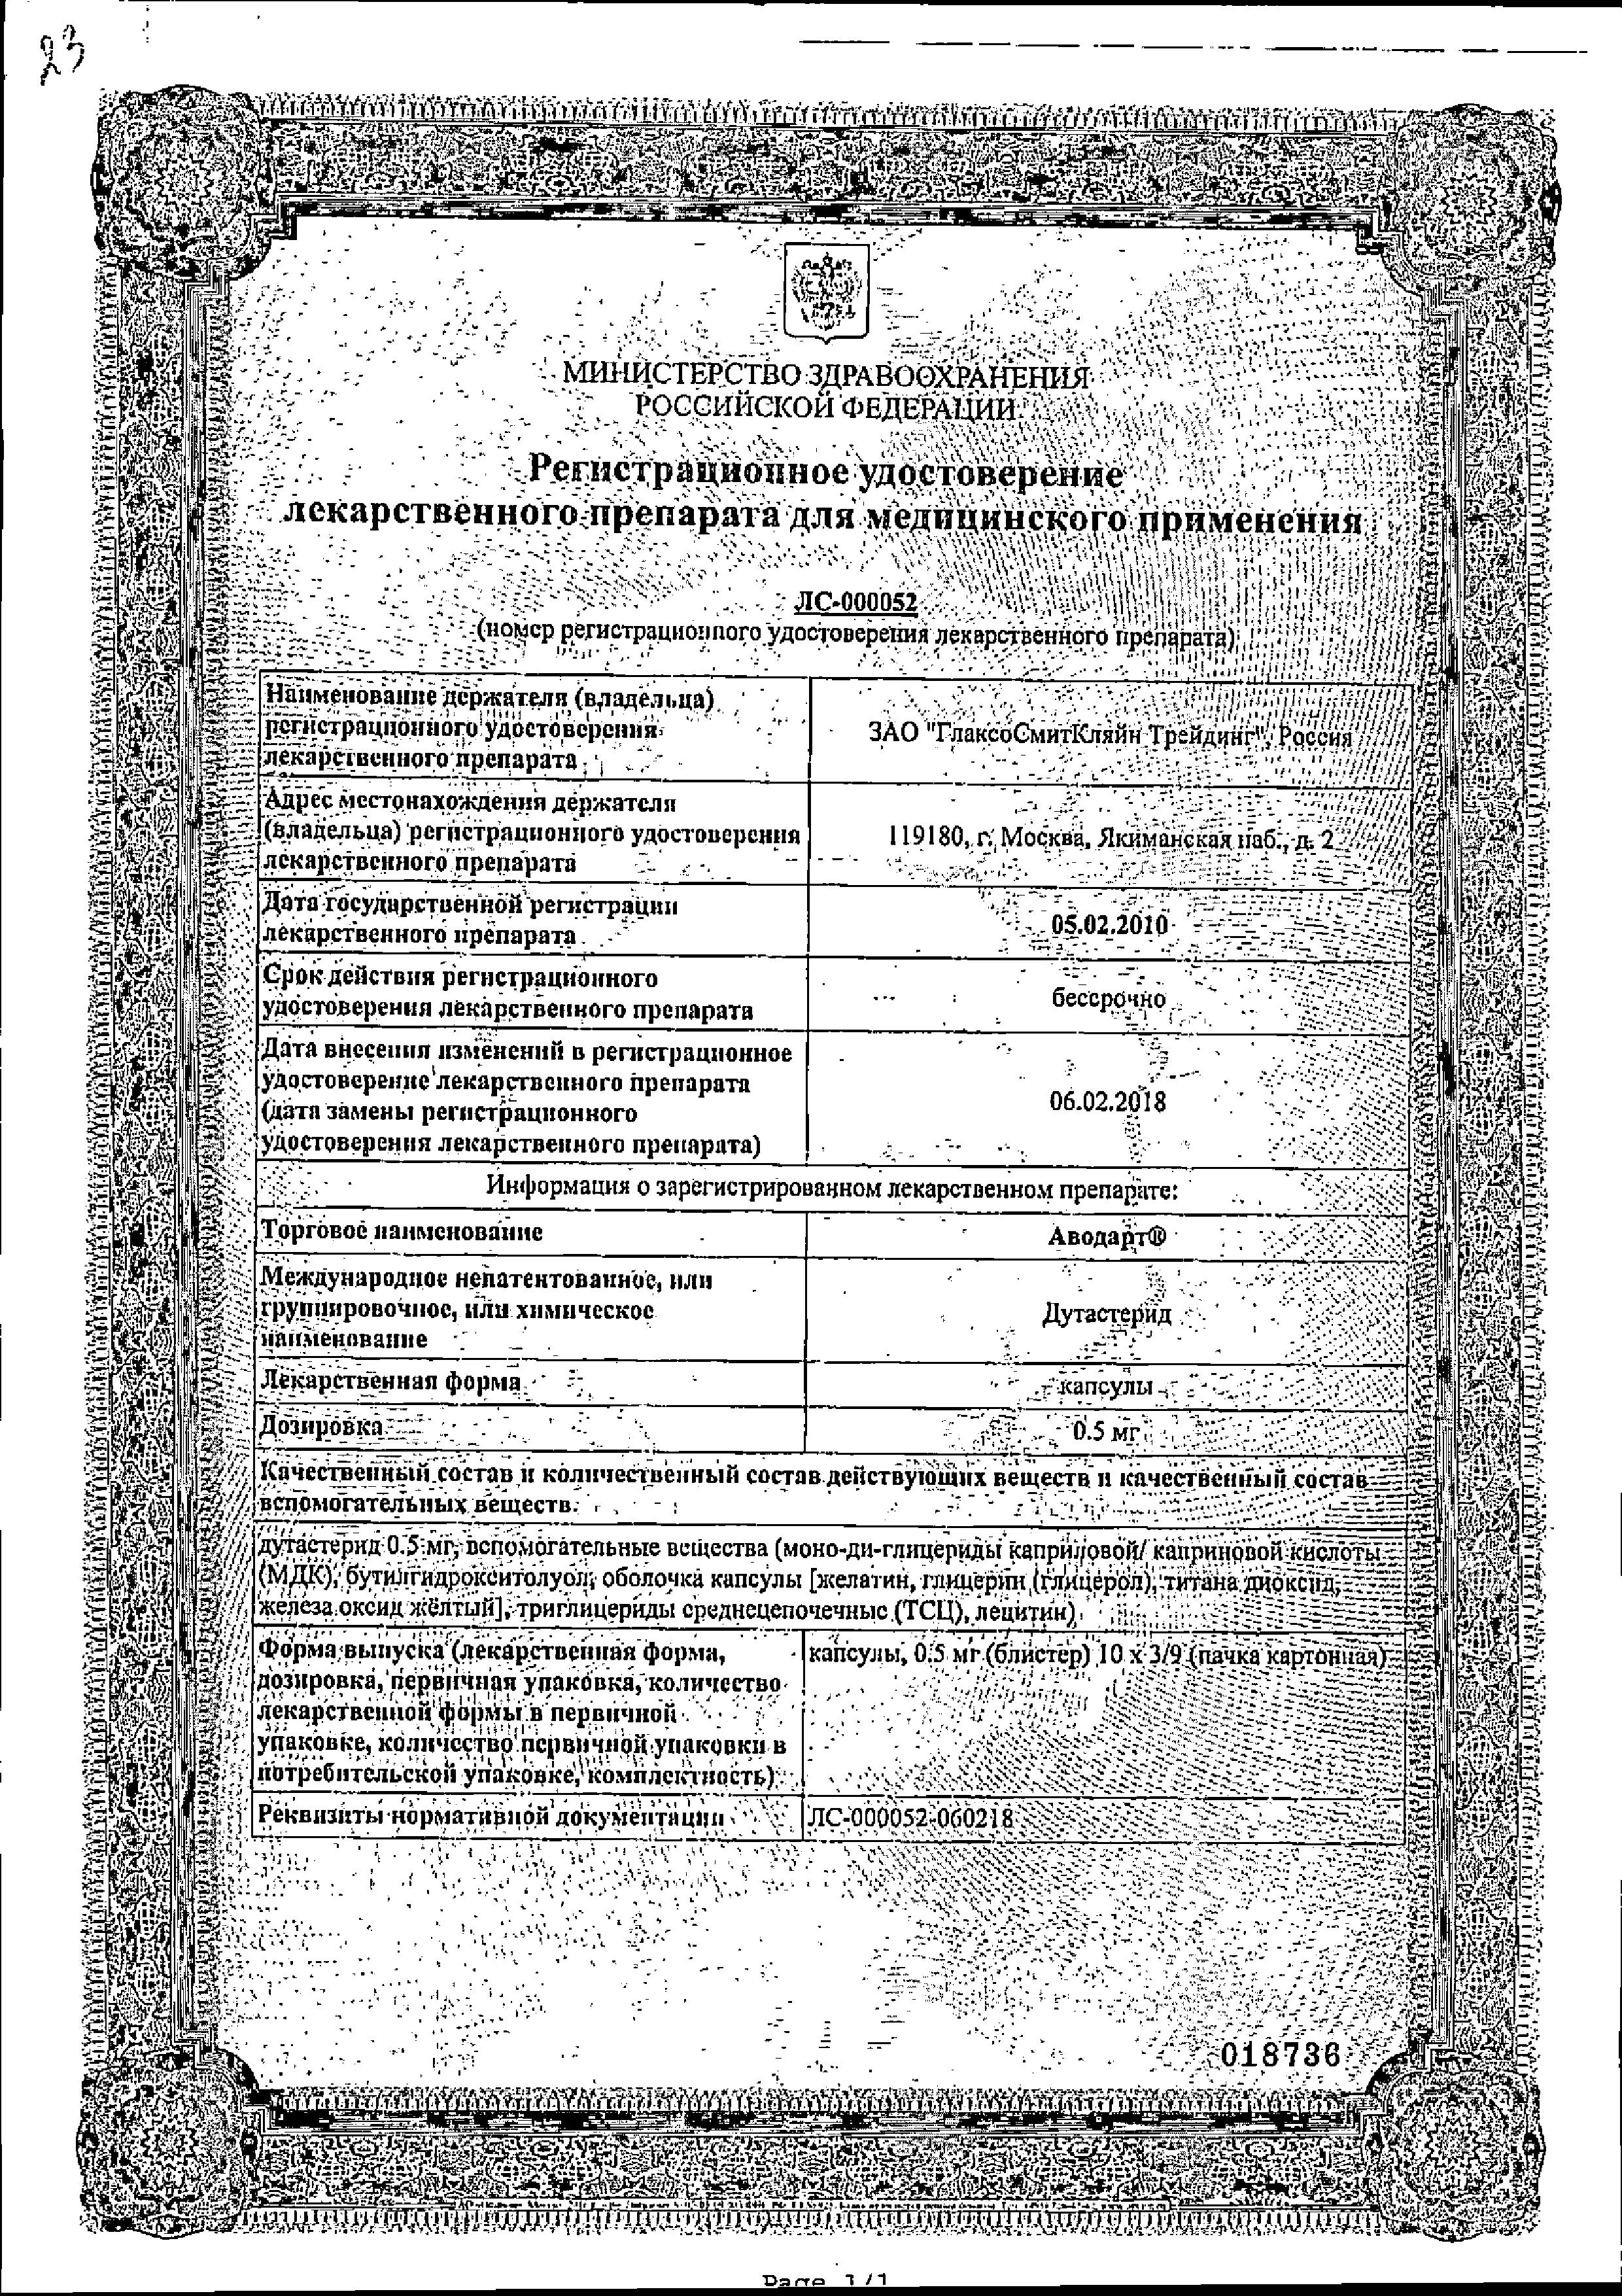 Аводарт сертификат